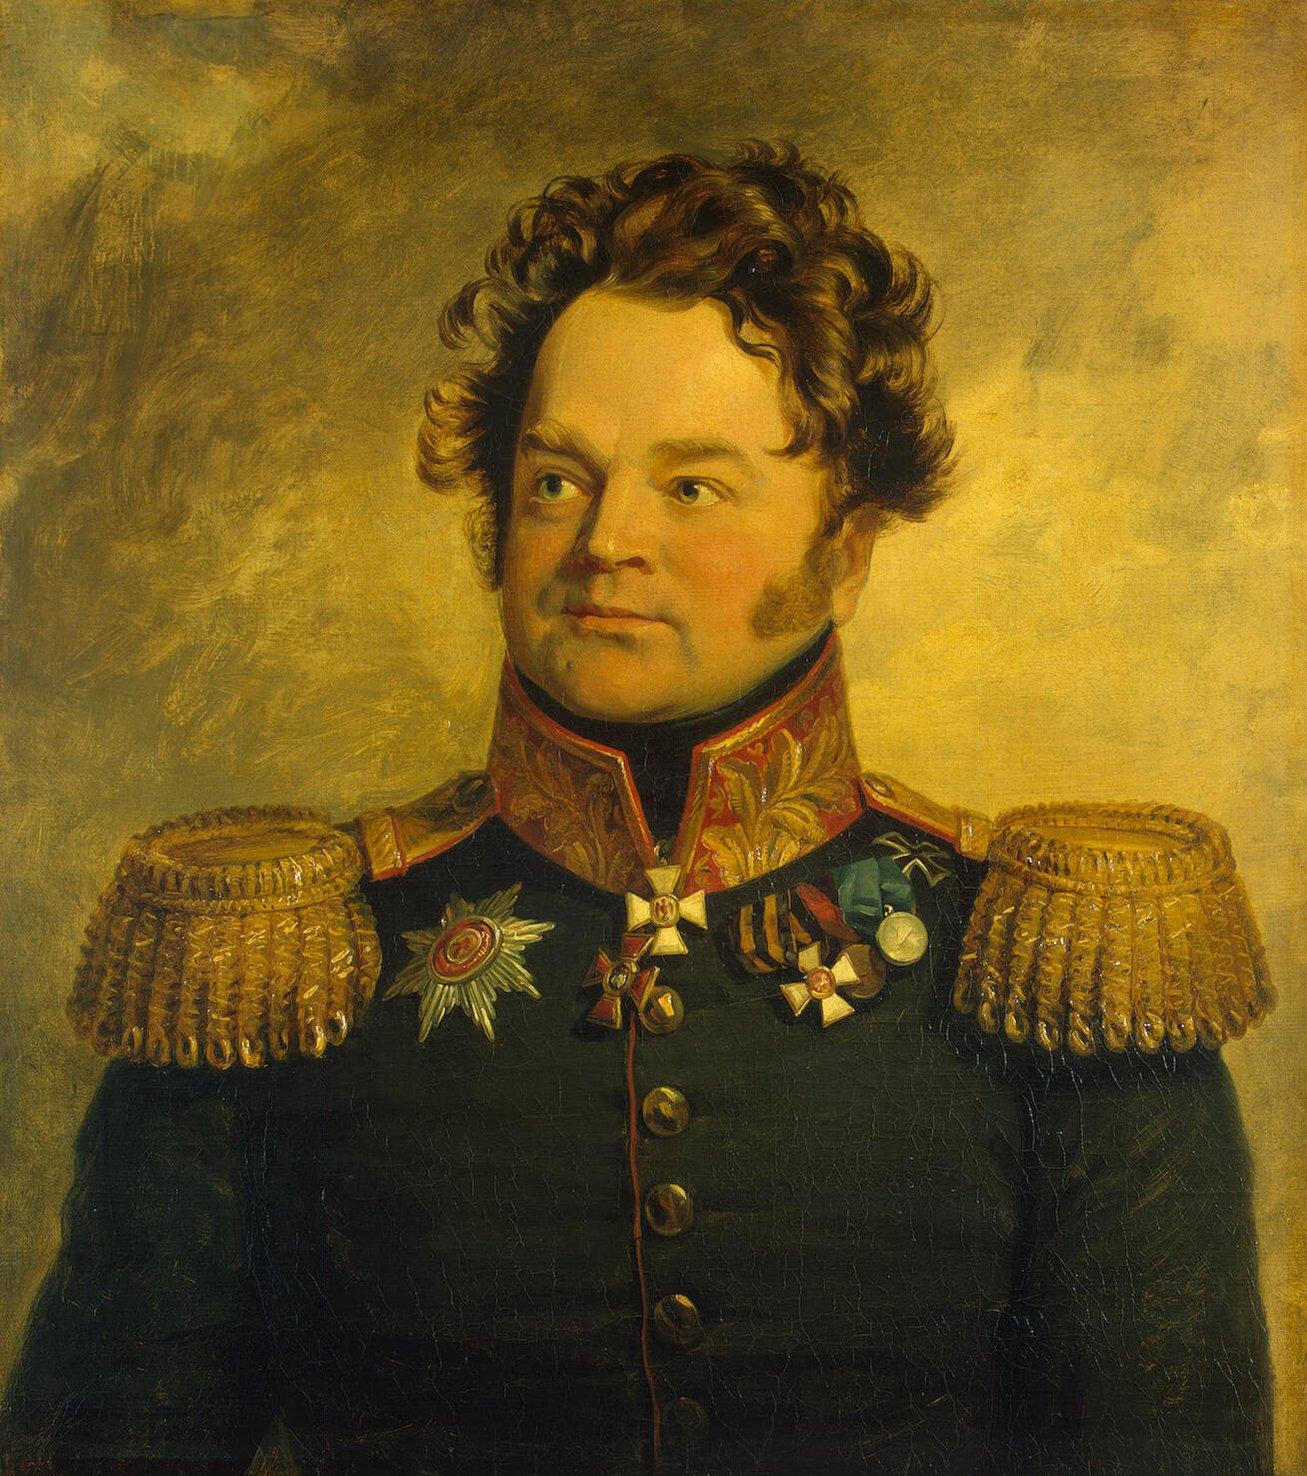 Свечин, Никанор Михайлович